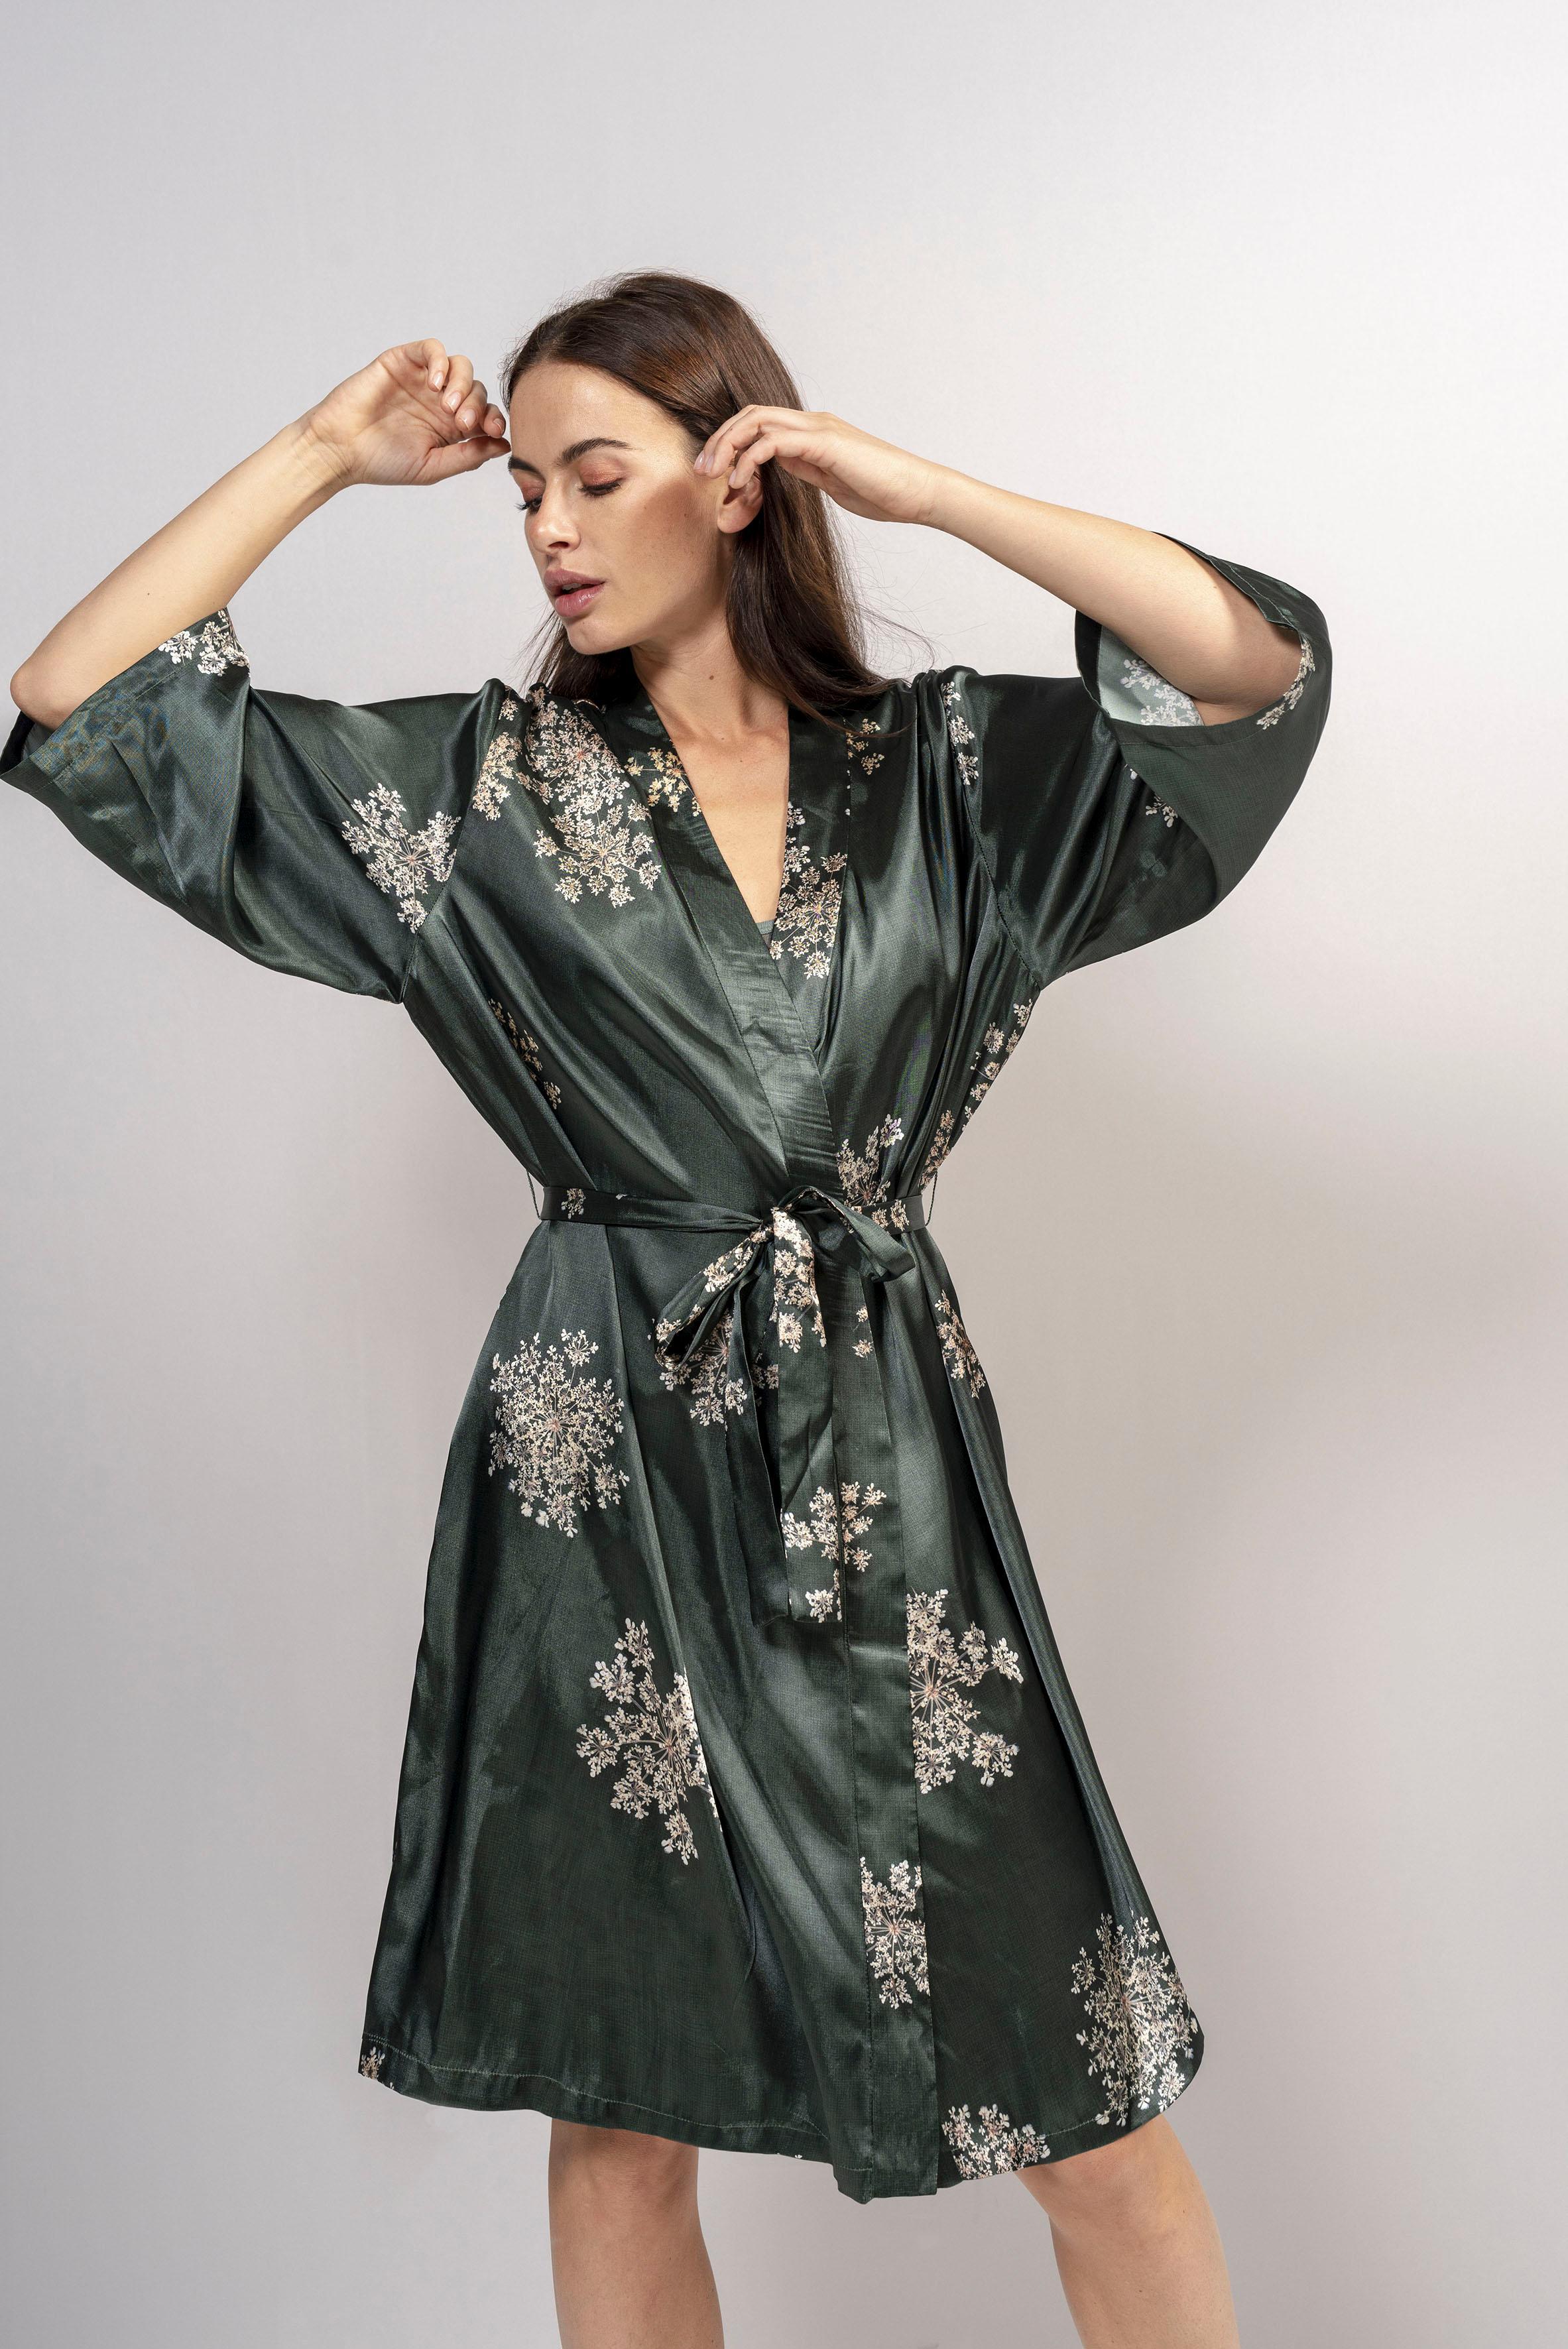 Kimono Sarai Lauren Essenza | Bekleidung > Homewear > Kimonos | Essenza